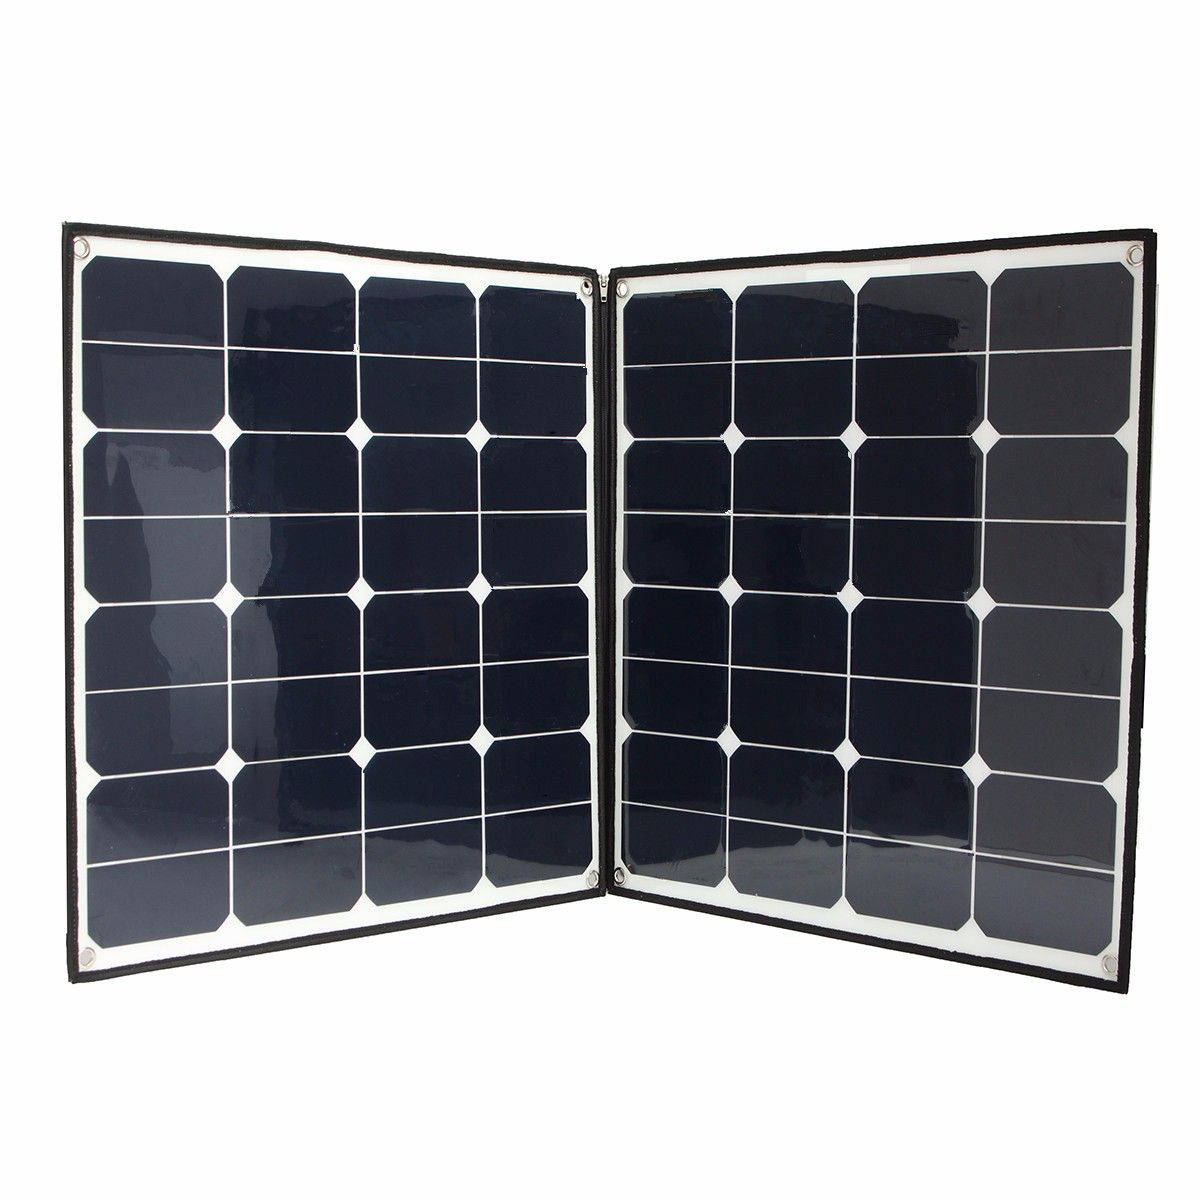 Elfeland Sp 20 100w 18v Folding Portable Solar Panel Photovoltaic Zipper Charge Caravan Portable Solar Panels Solar Panels Solar Panels For Home